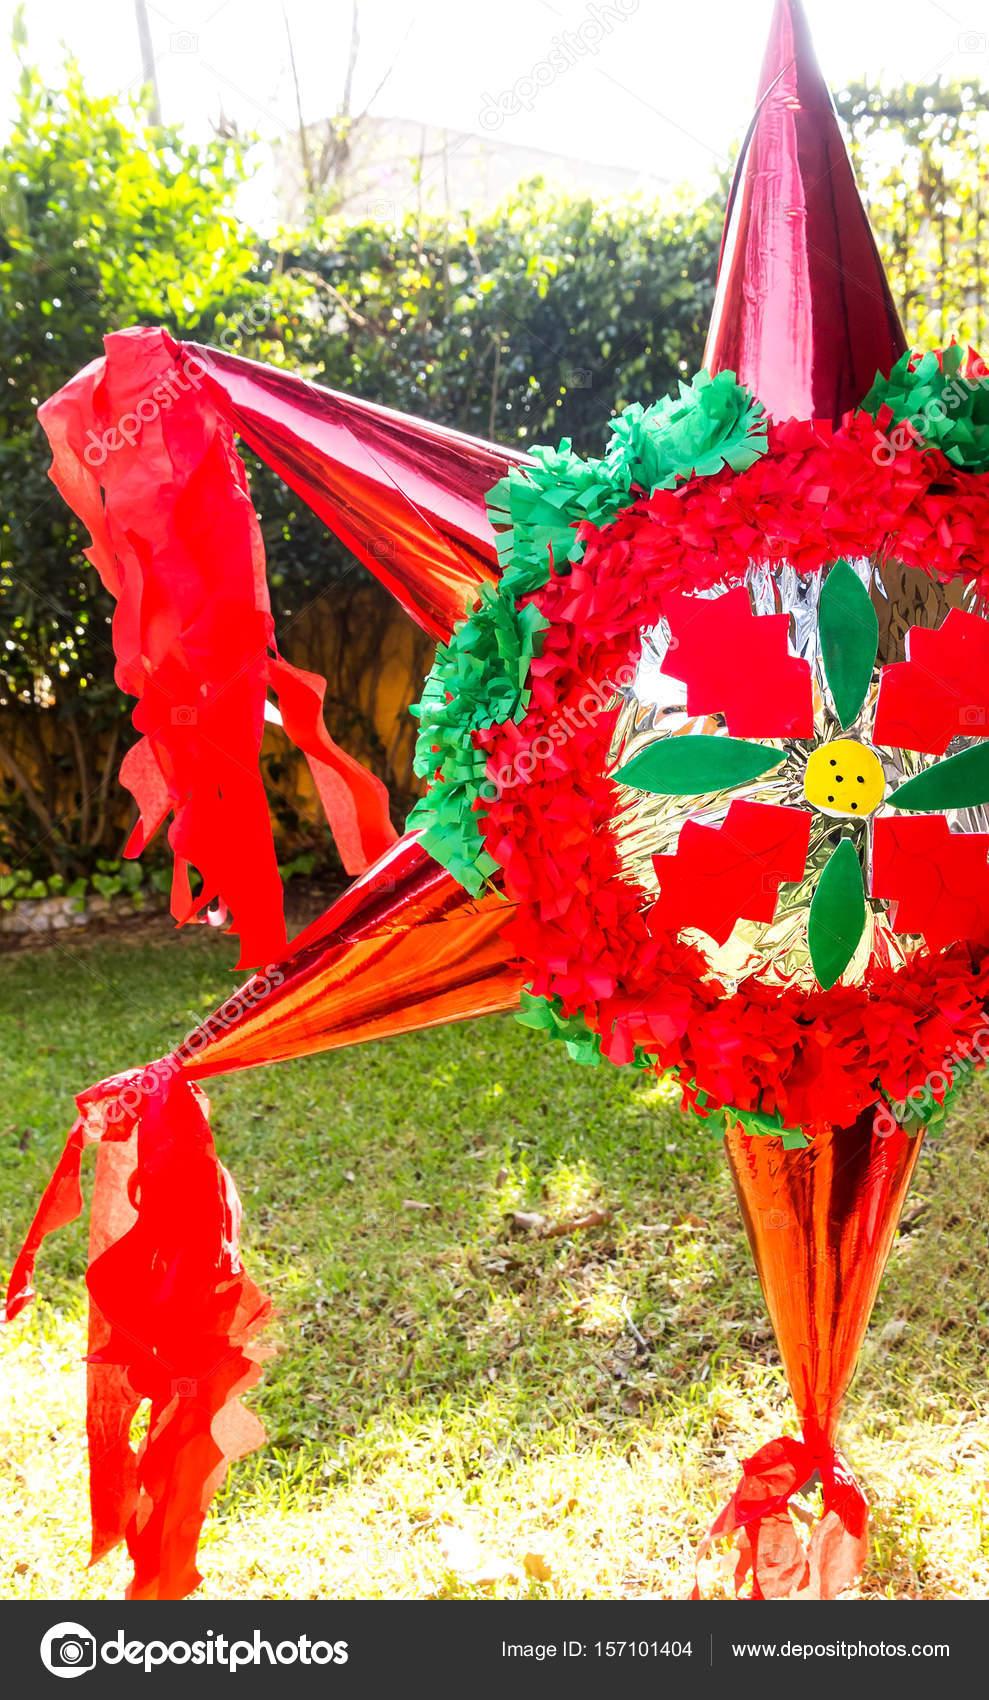 Christmas Pinata.Star Christmas Pinata With Candy Stock Photo C Zsuriel